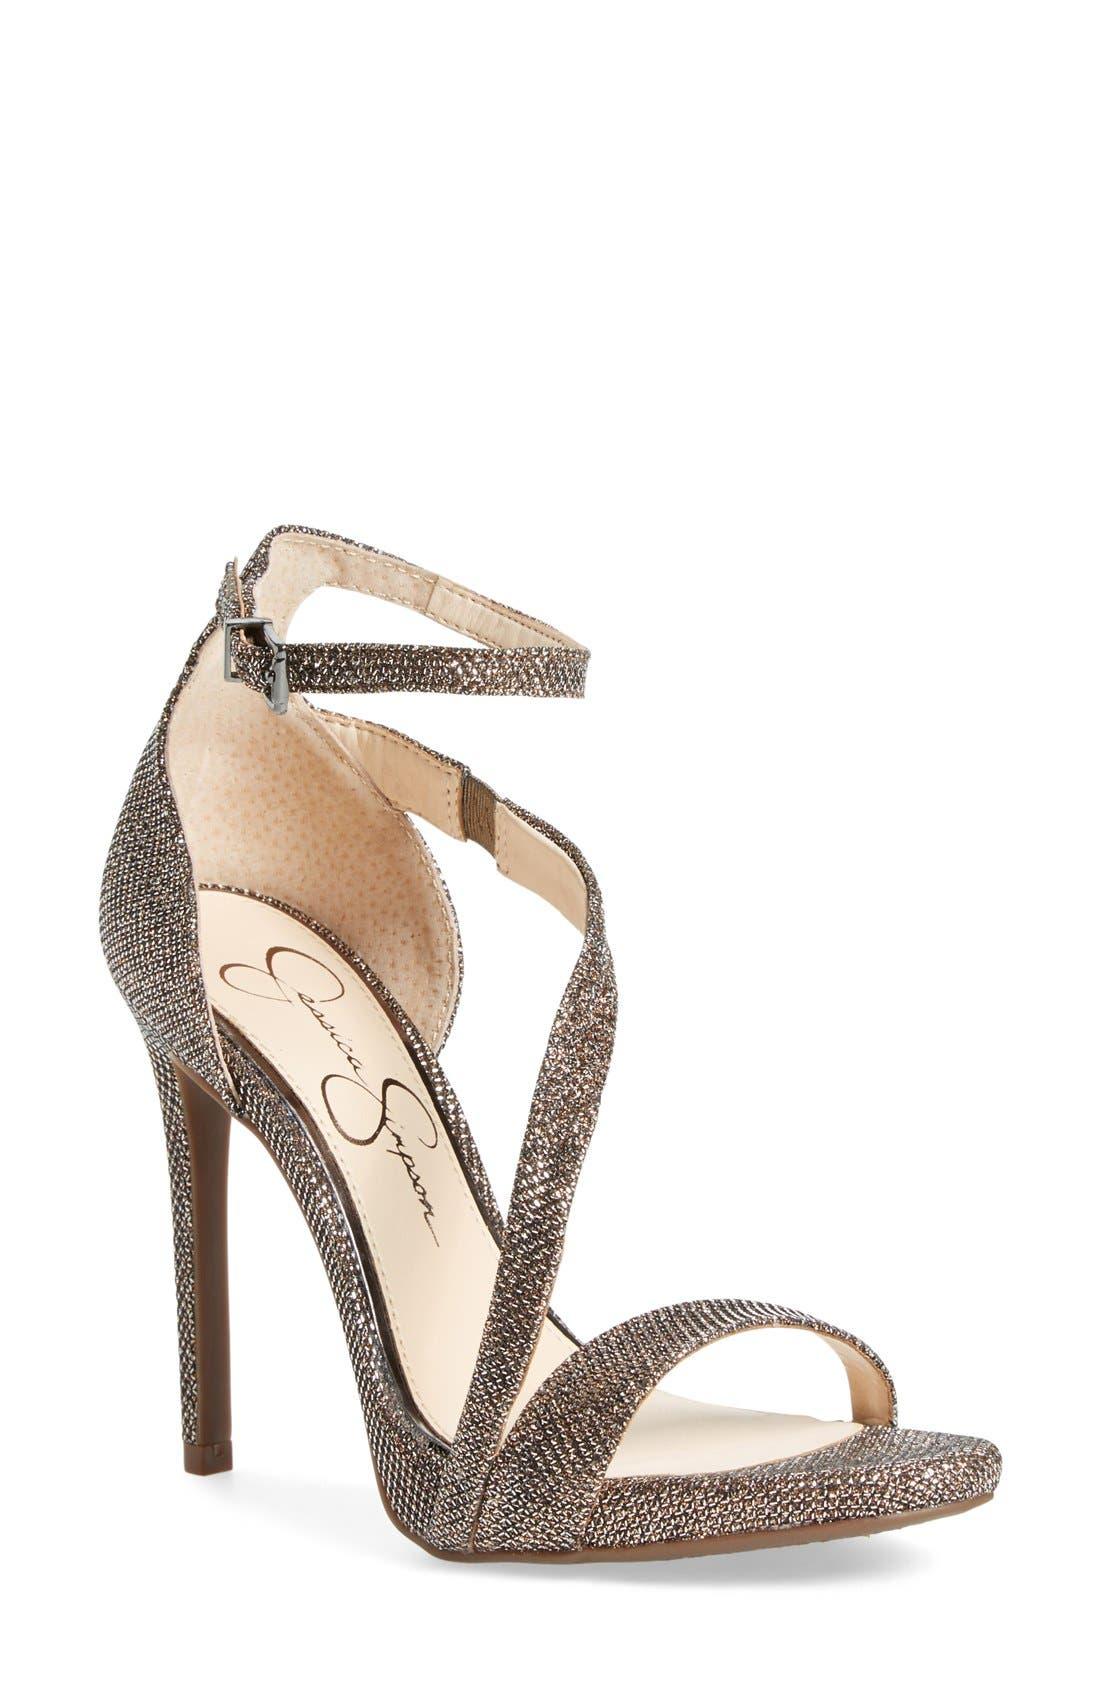 Alternate Image 1 Selected - Jessica Simpson 'Rayli' Patent Ankle Strap Sandal (Women)